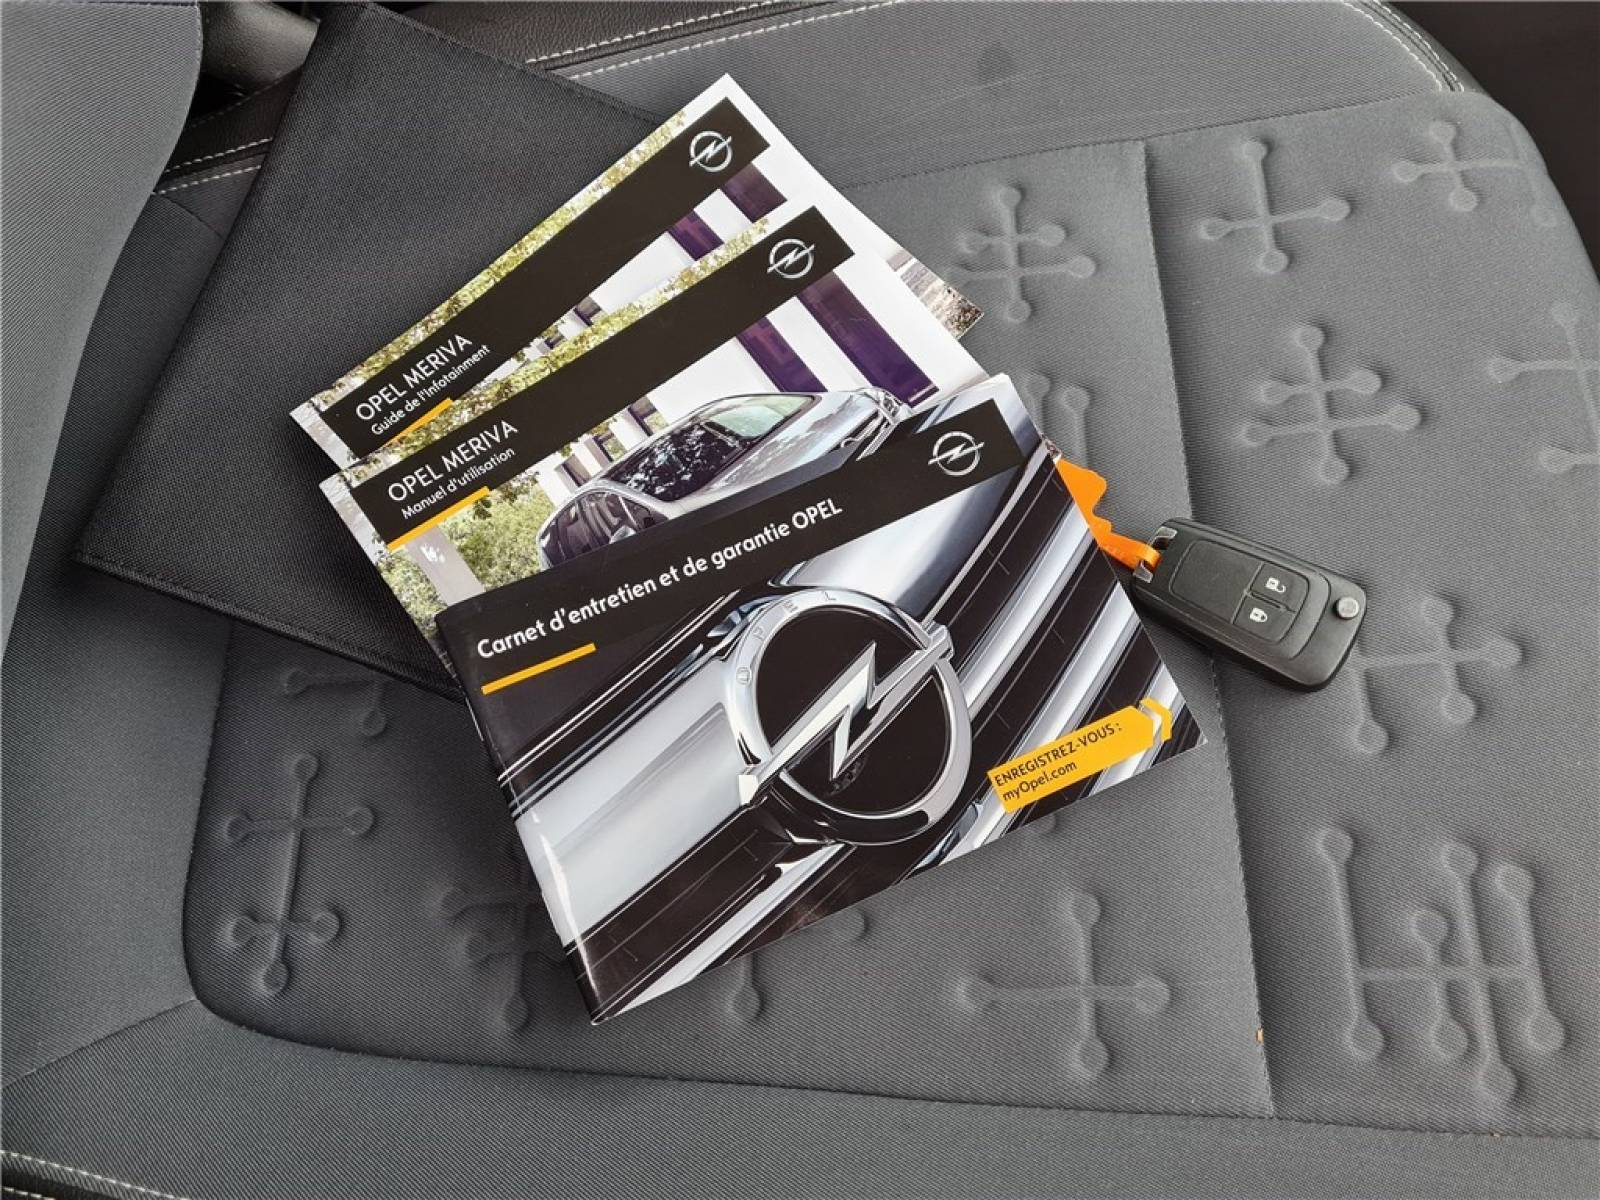 OPEL Meriva 1.6 CDTI - 110 ch Start/Stop - véhicule d'occasion - Groupe Guillet - Opel Magicauto - Chalon-sur-Saône - 71380 - Saint-Marcel - 48